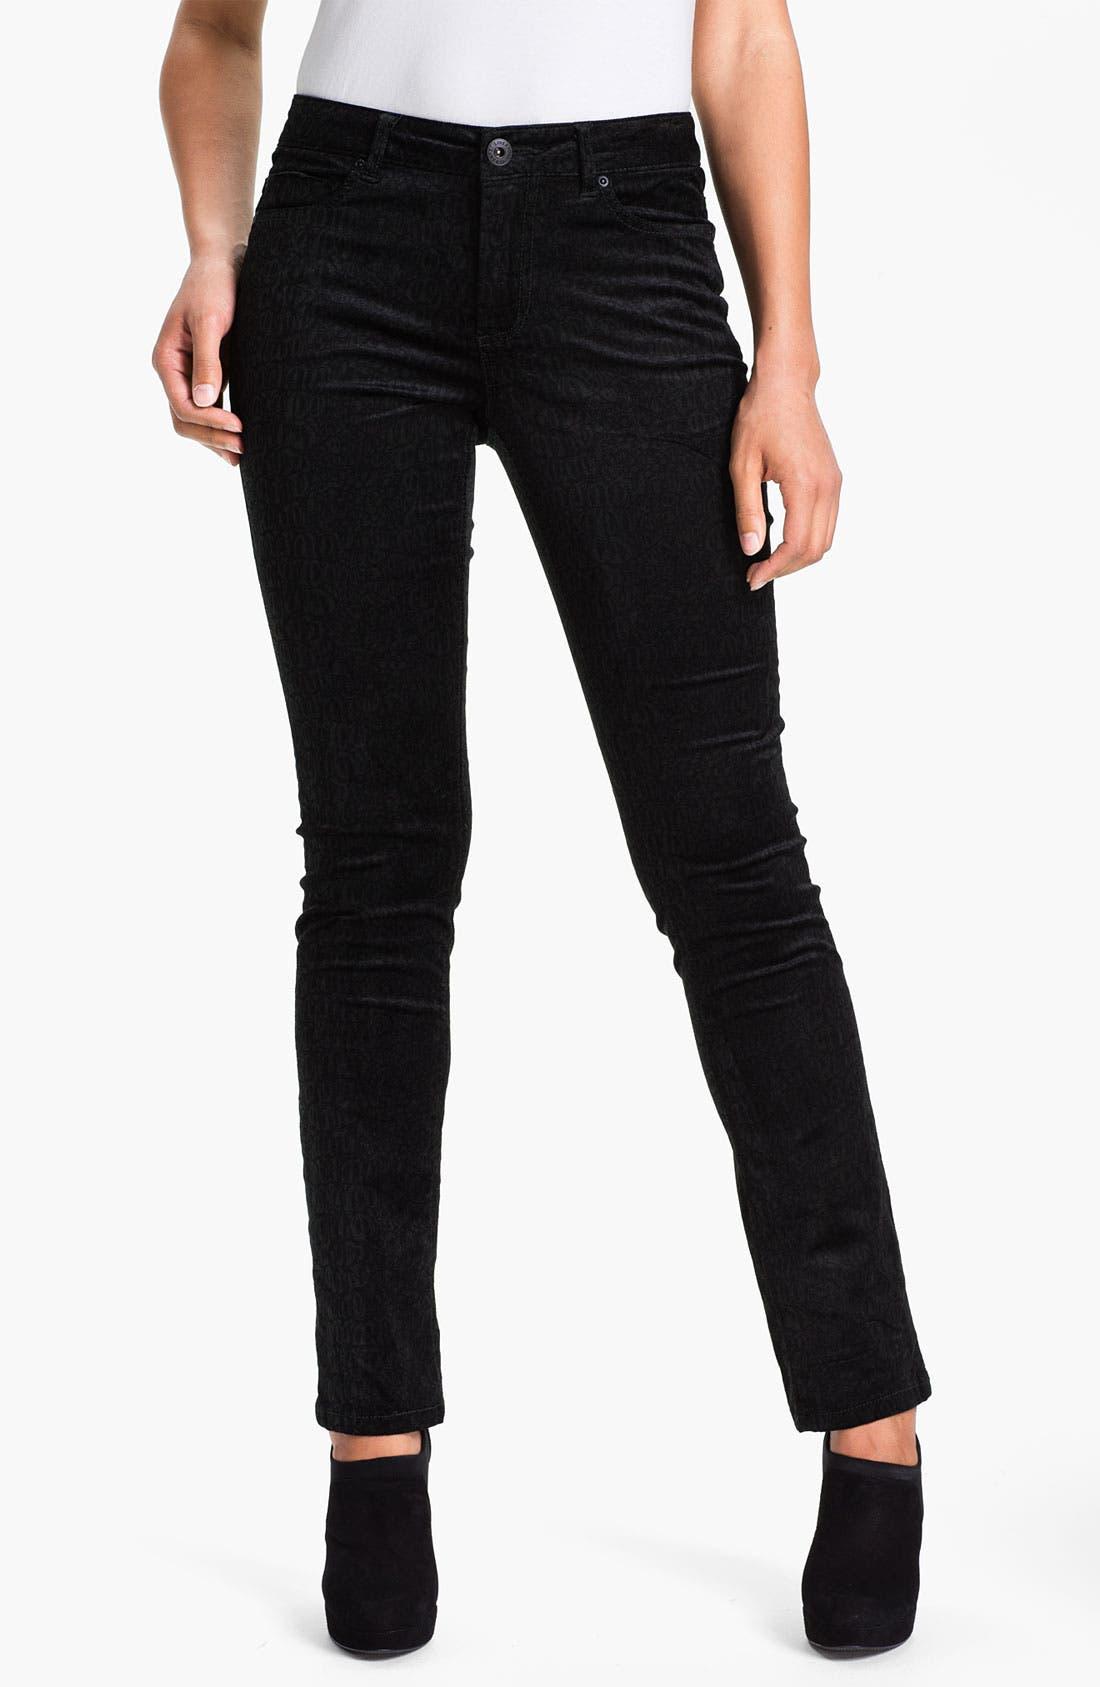 Main Image - Liverpool Jeans Company 'Sadie' - Cheetah' Straight Leg Velveteen Jeans